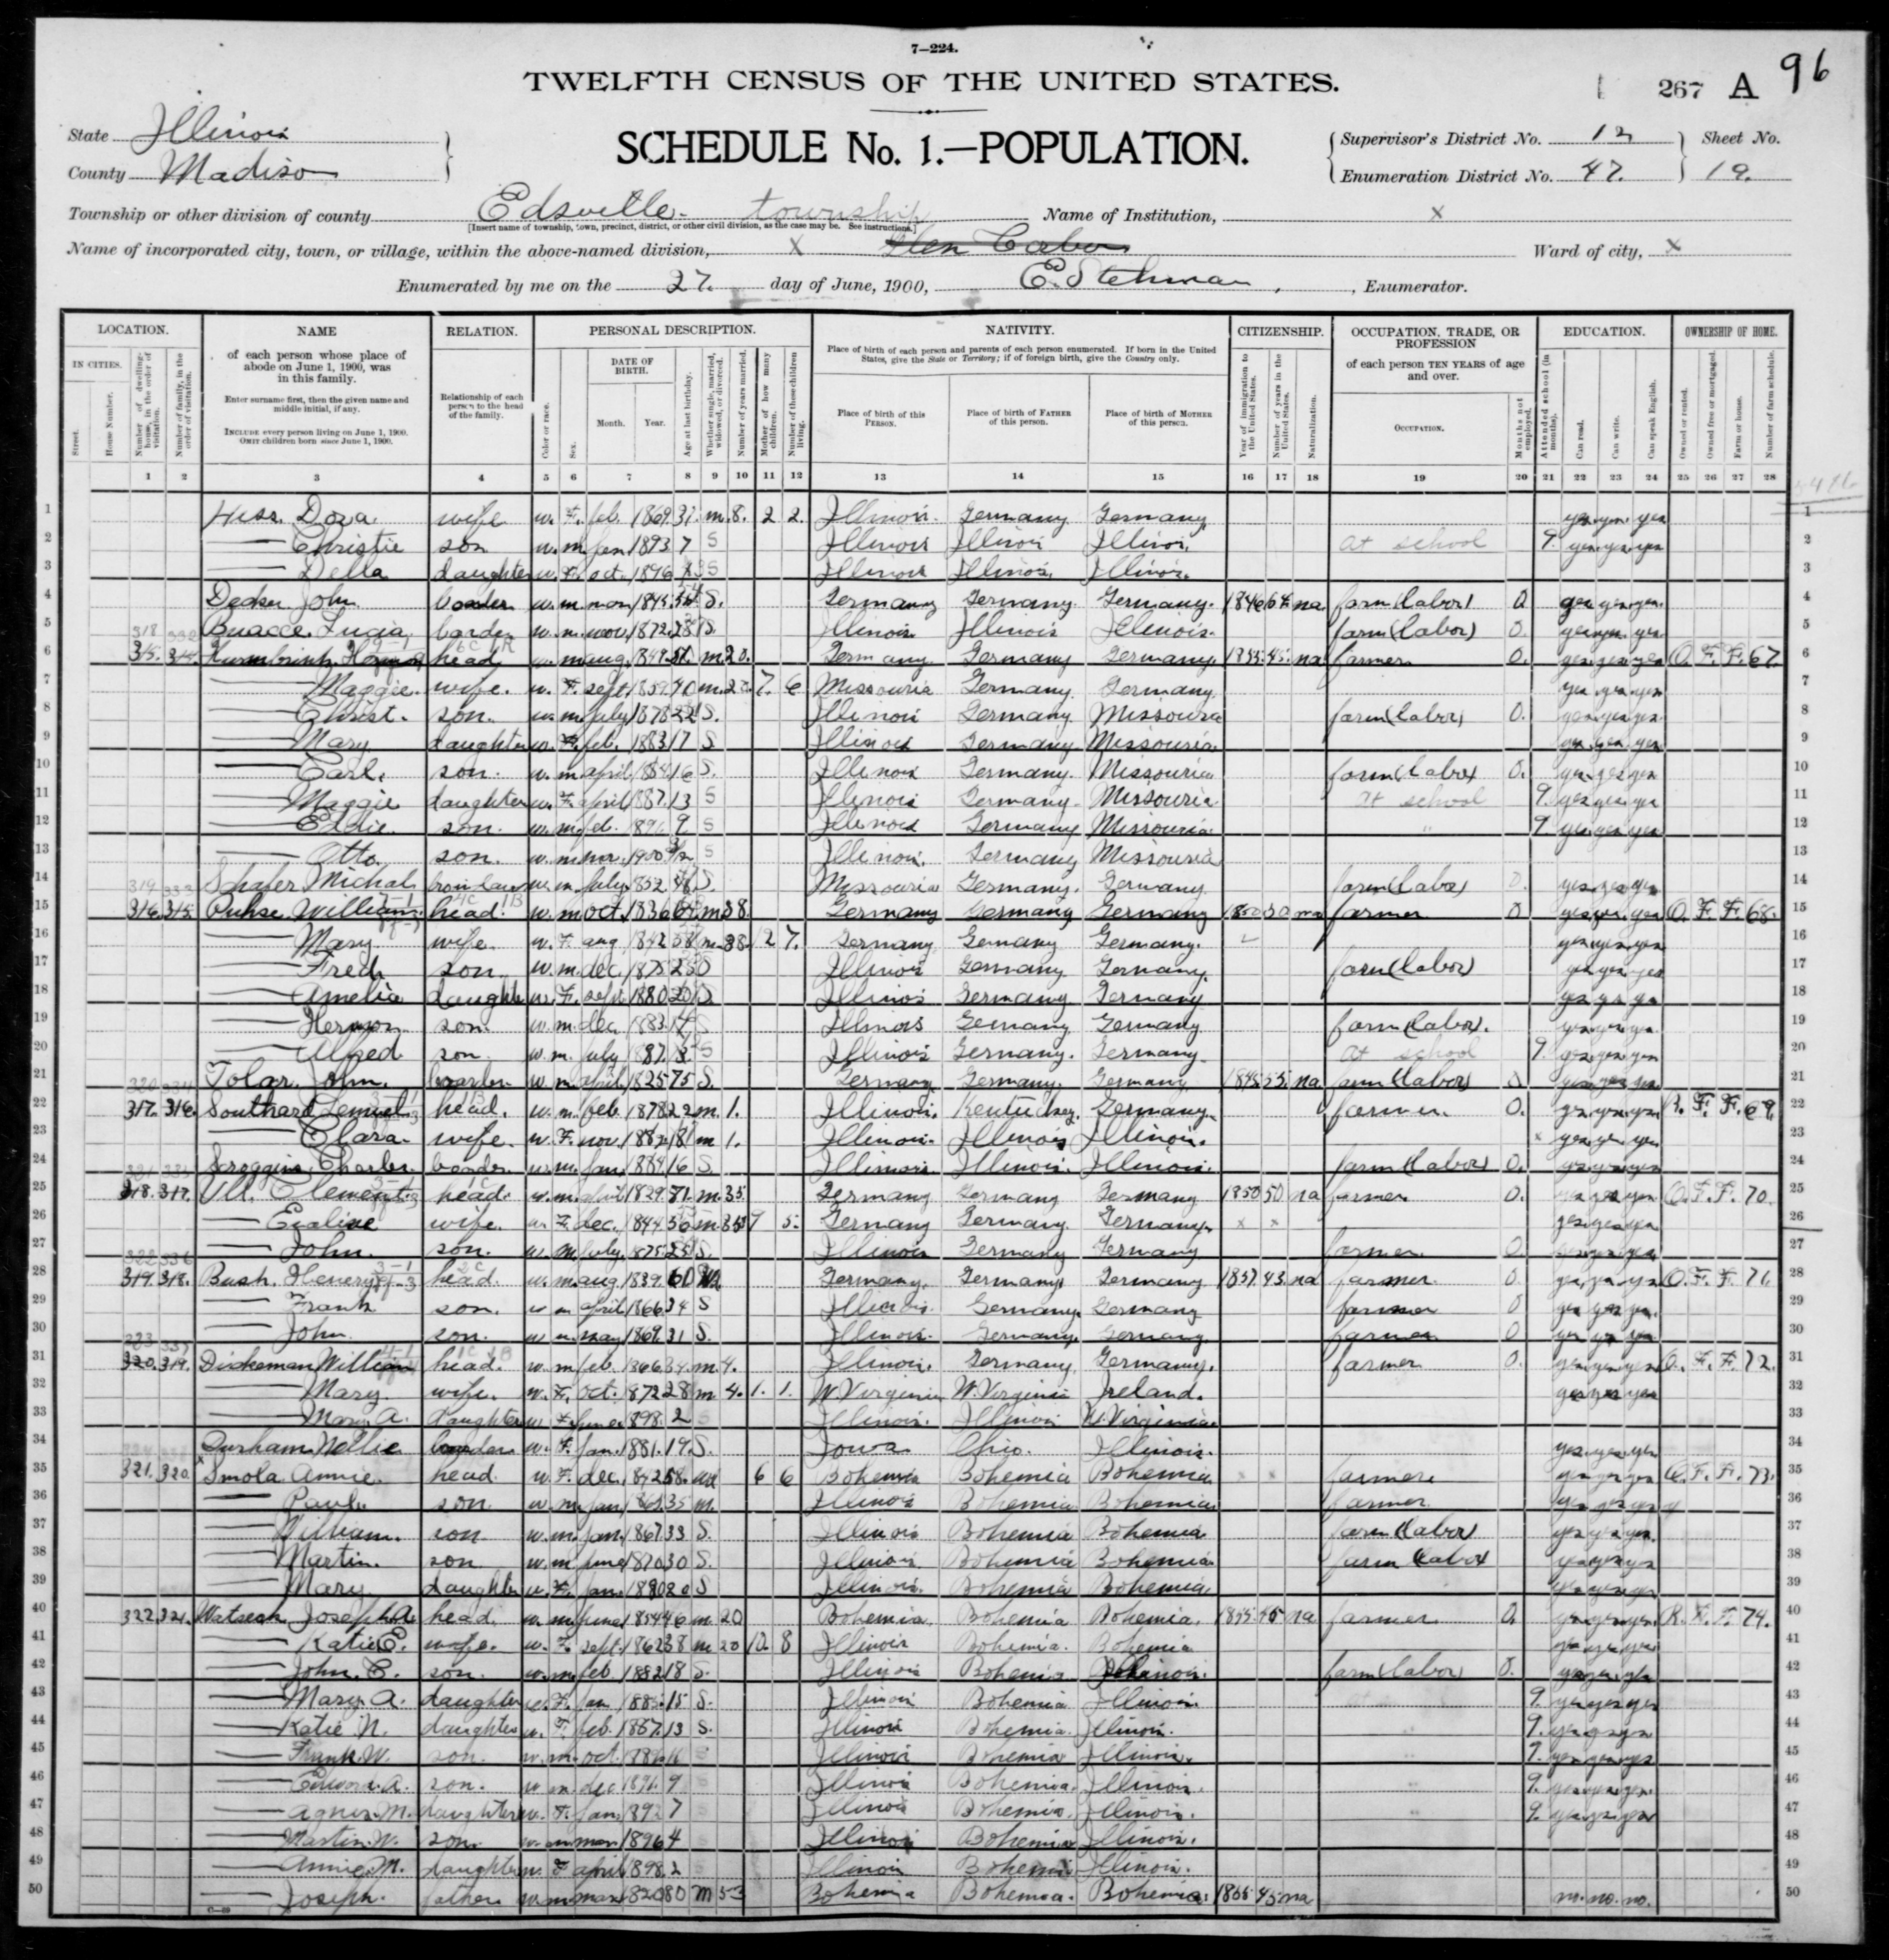 Illinois: MADISON County, Enumeration District 47, Sheet No. 19A